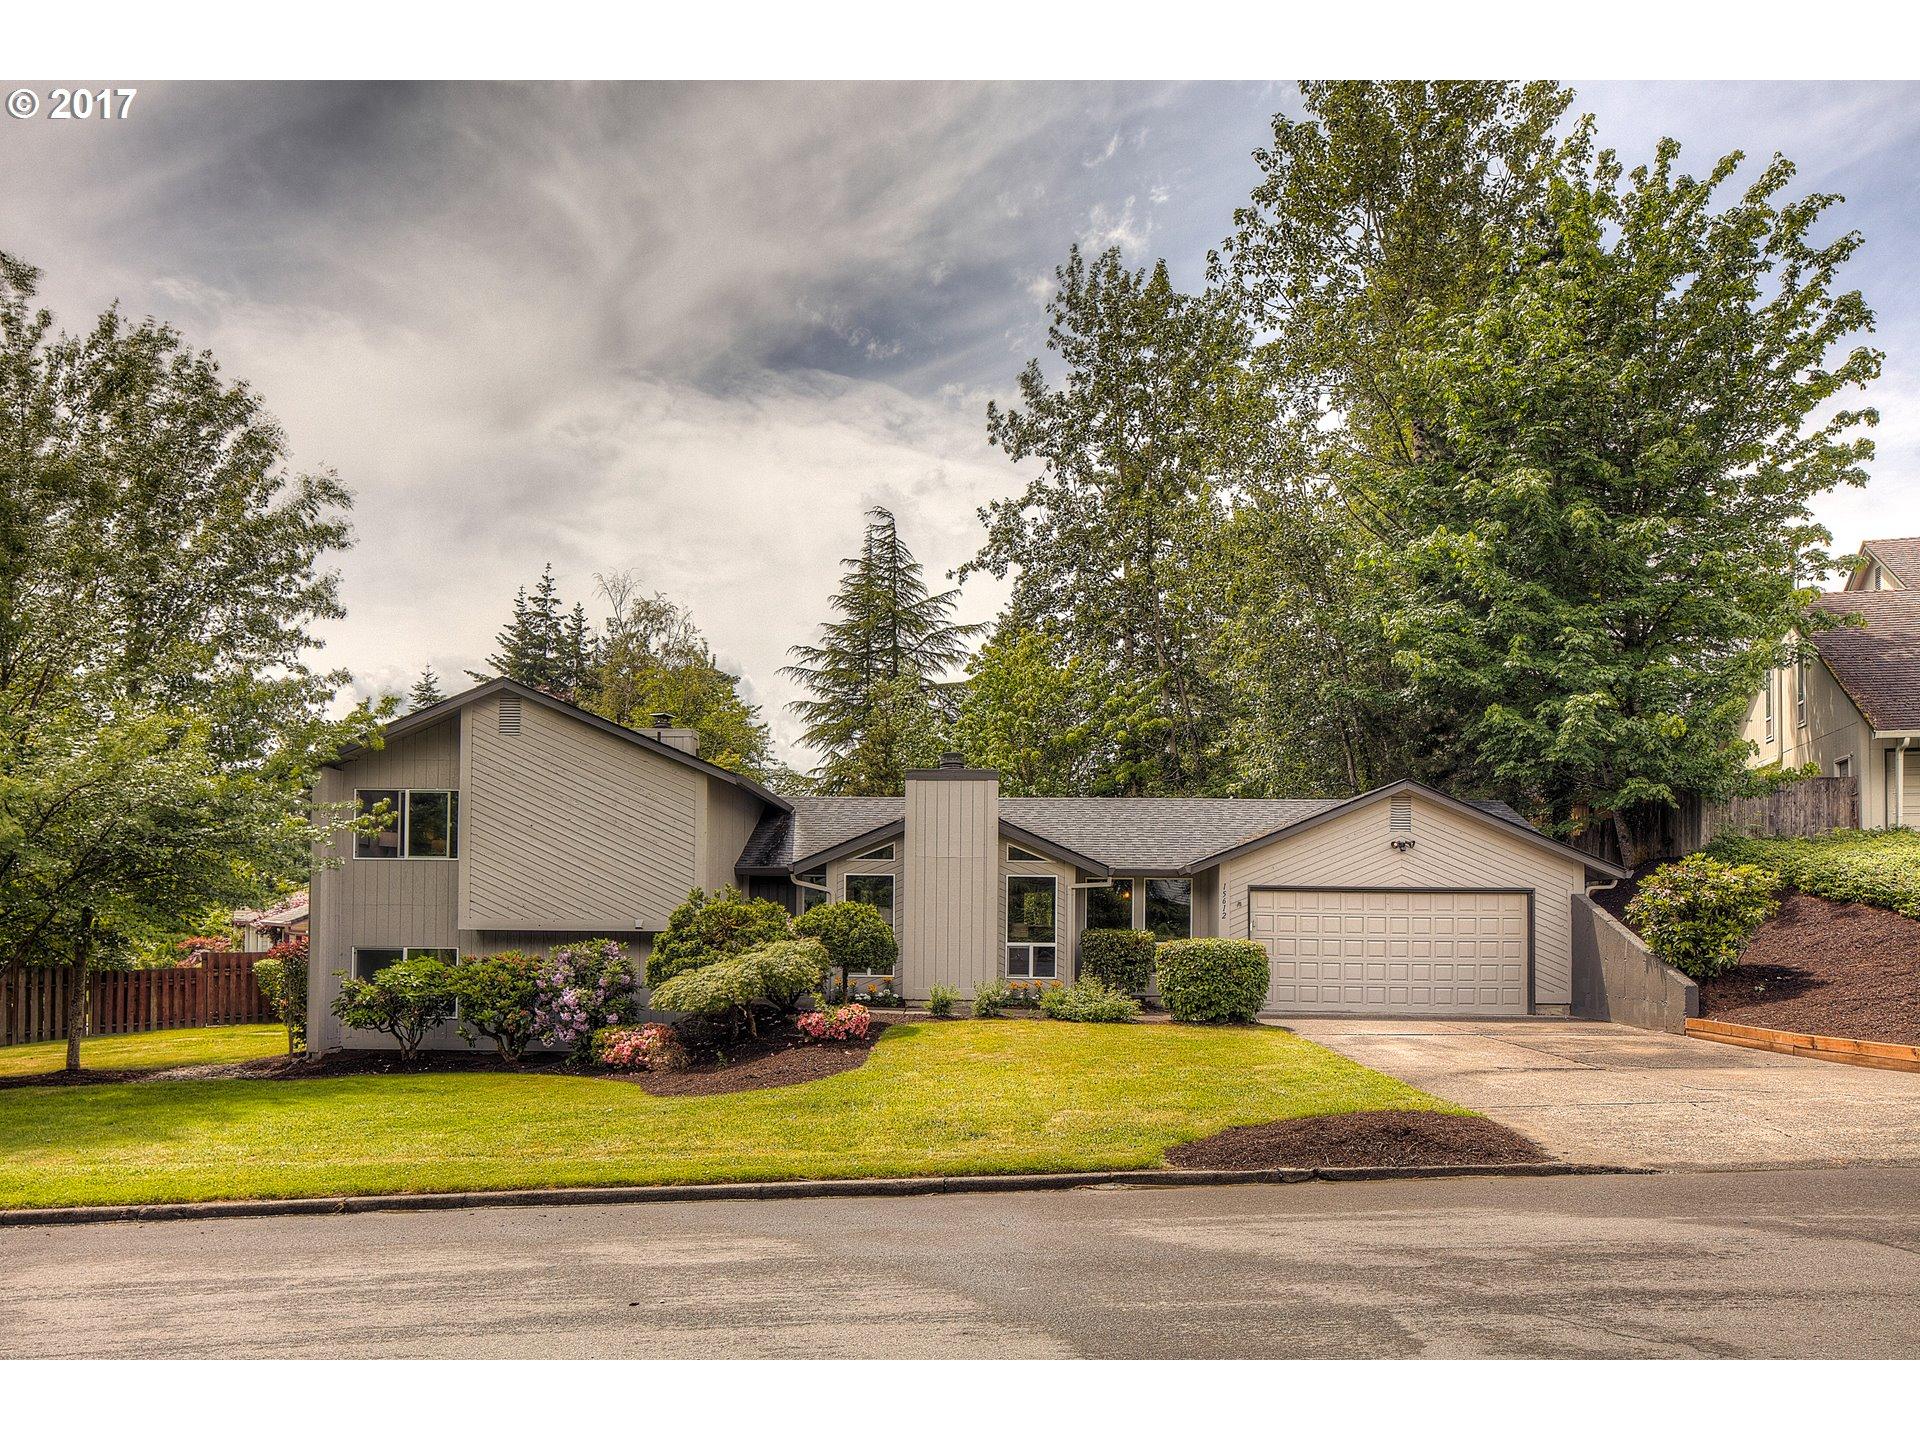 15612 NE 25TH AVE Vancouver, WA 98686 - MLS #: 17499149